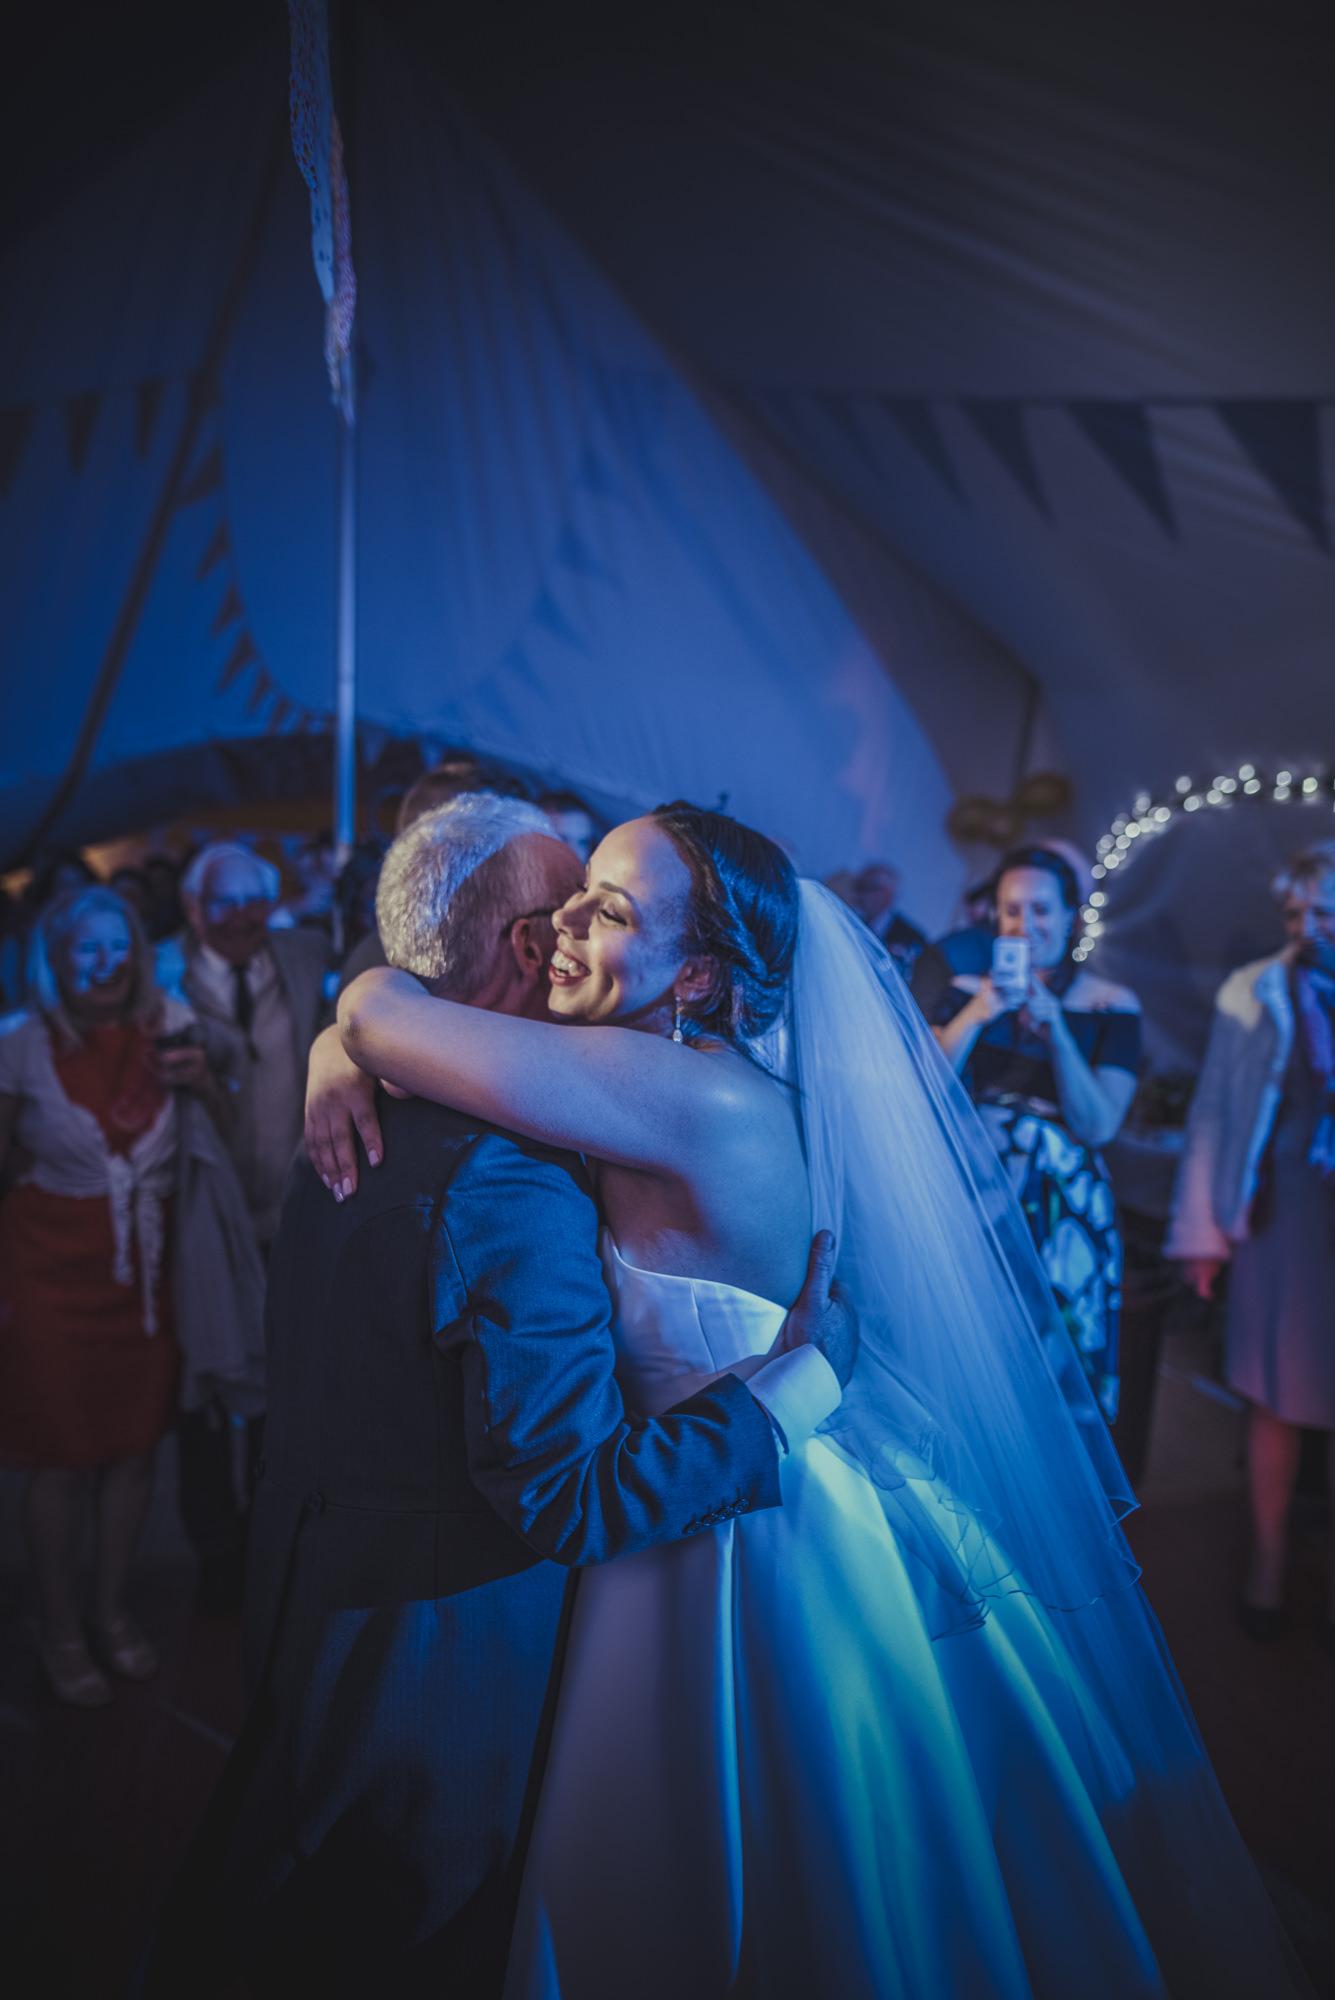 Jacqueline-Gareth-Wedding-Westmead-Events-Surrey-Manu-Mendoza-Wedding-Photography-559.jpg